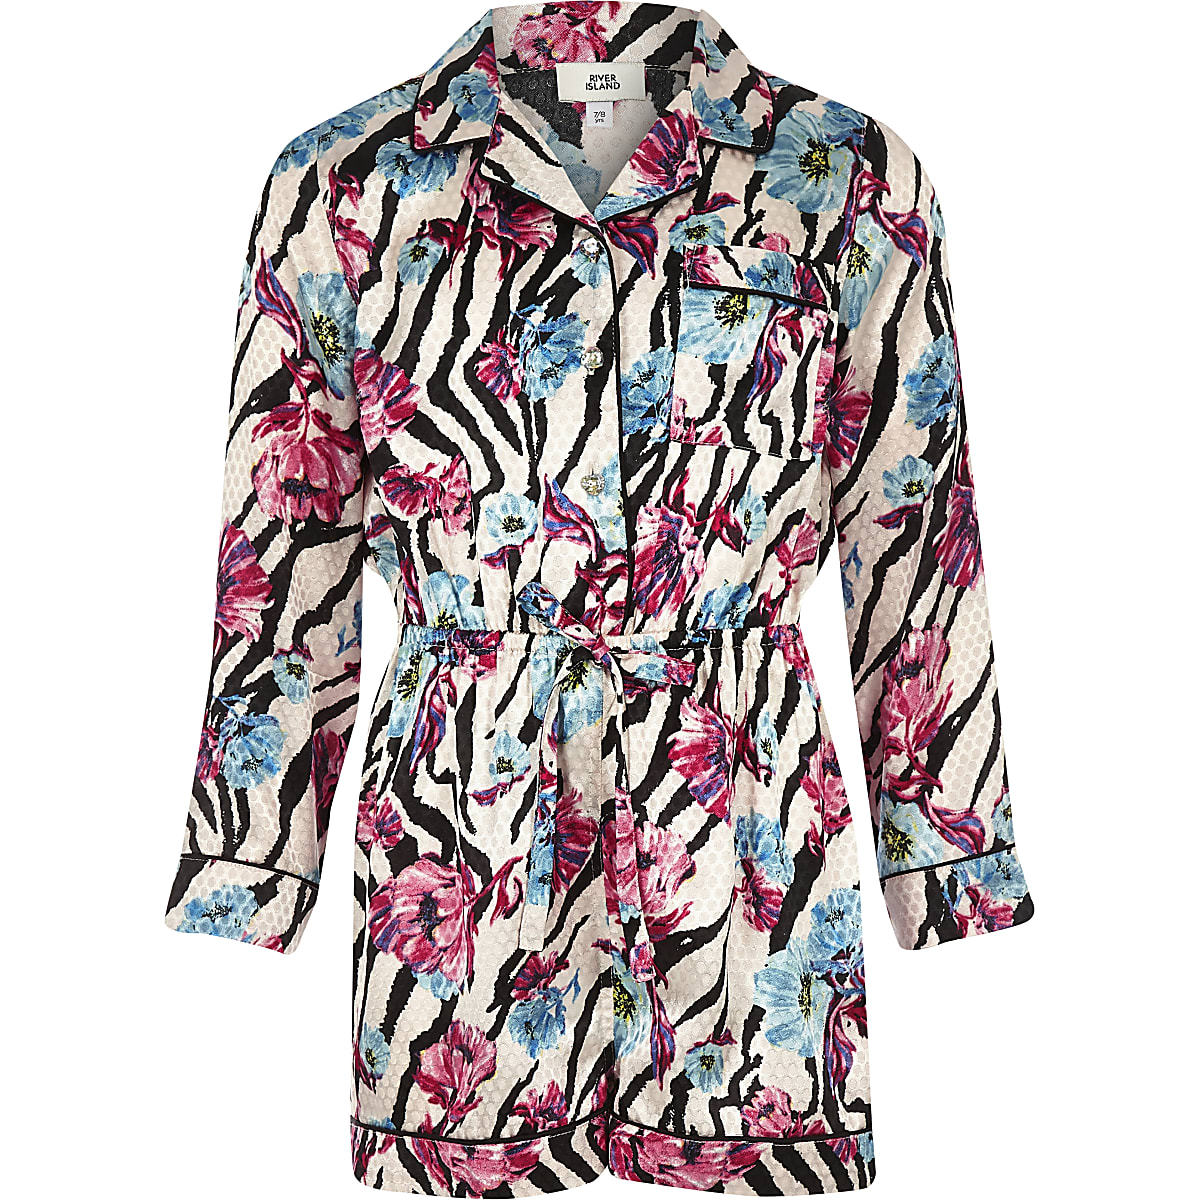 Girls pink zebra floral print pyjama playsuit